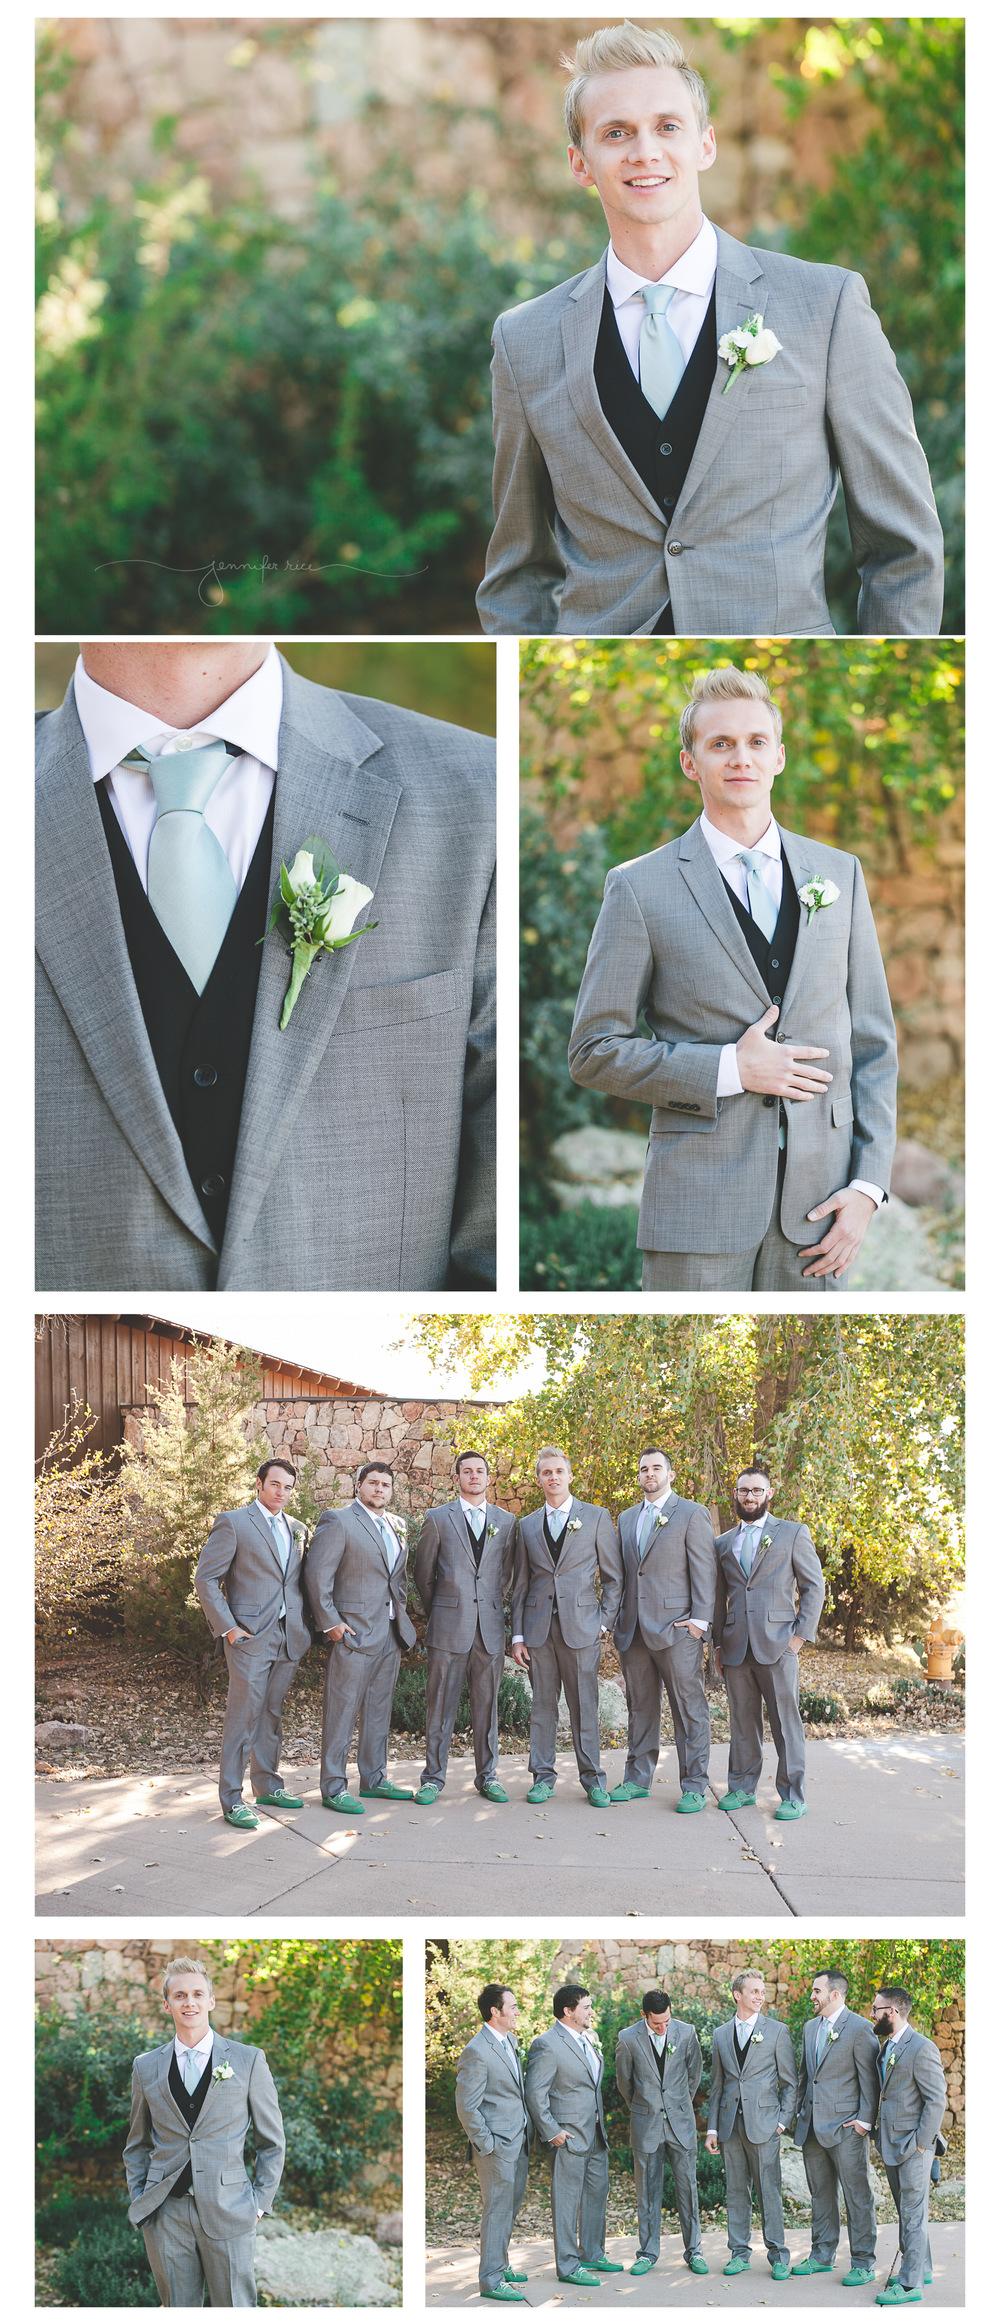 Blog-Koski-groomsmen.jpg